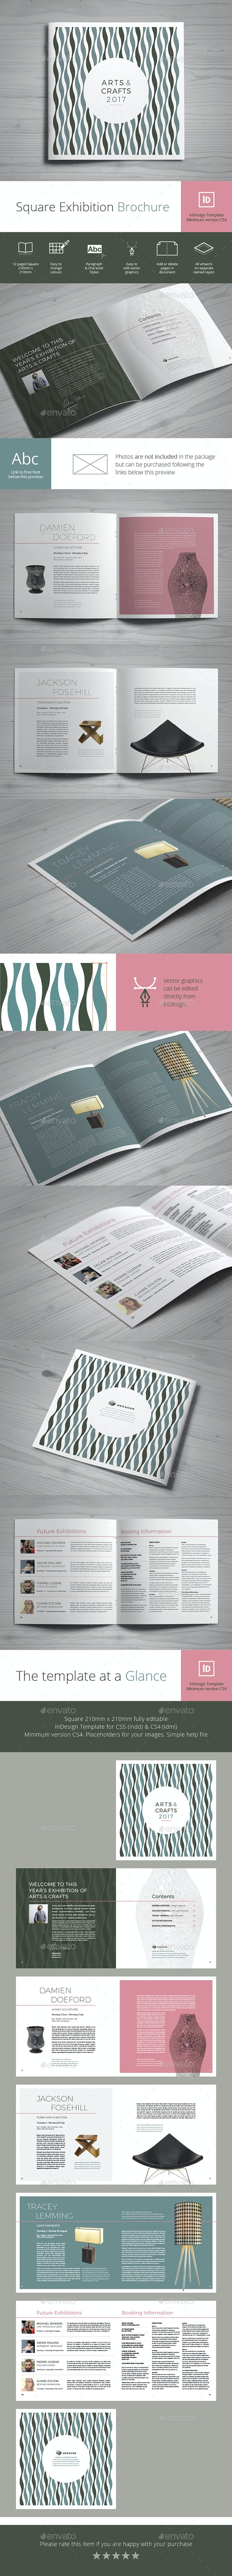 Square Exhibition Brochure - Brochures Print Templates